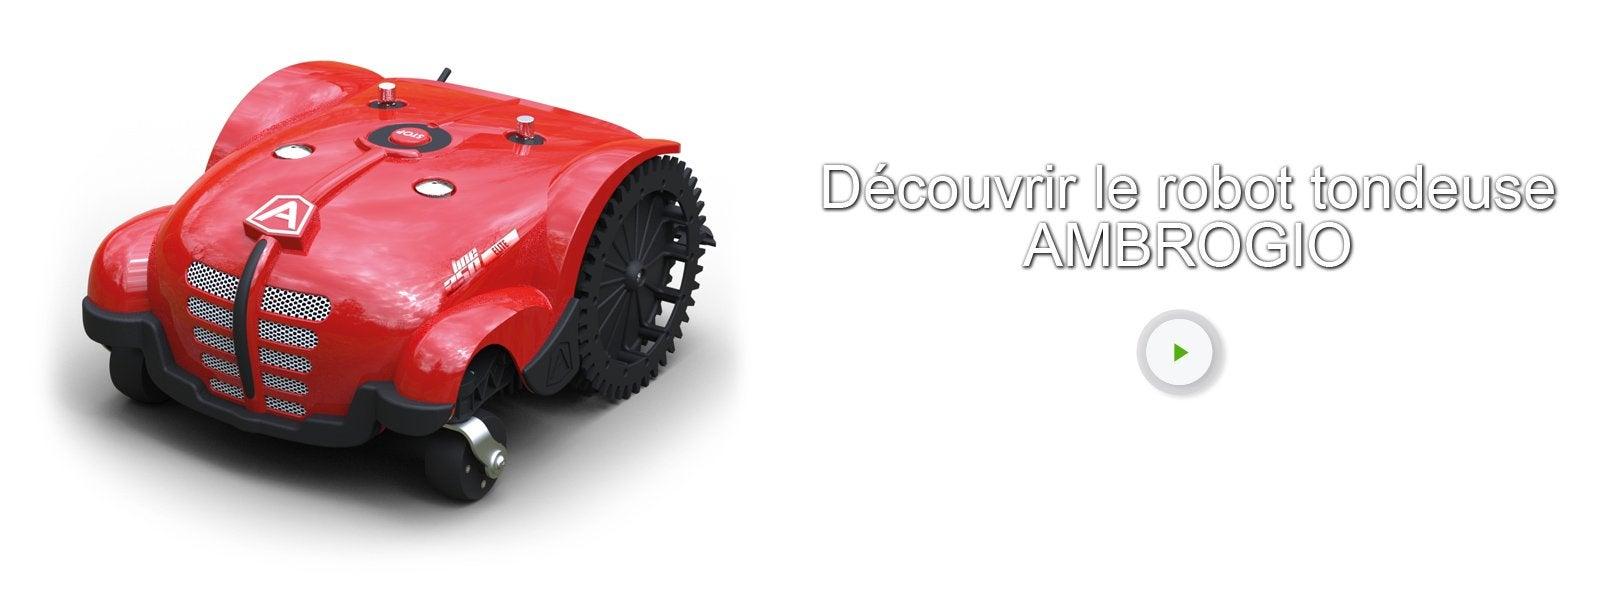 tondeuse robot connect e ambrogio l250 3500 m leroy merlin. Black Bedroom Furniture Sets. Home Design Ideas